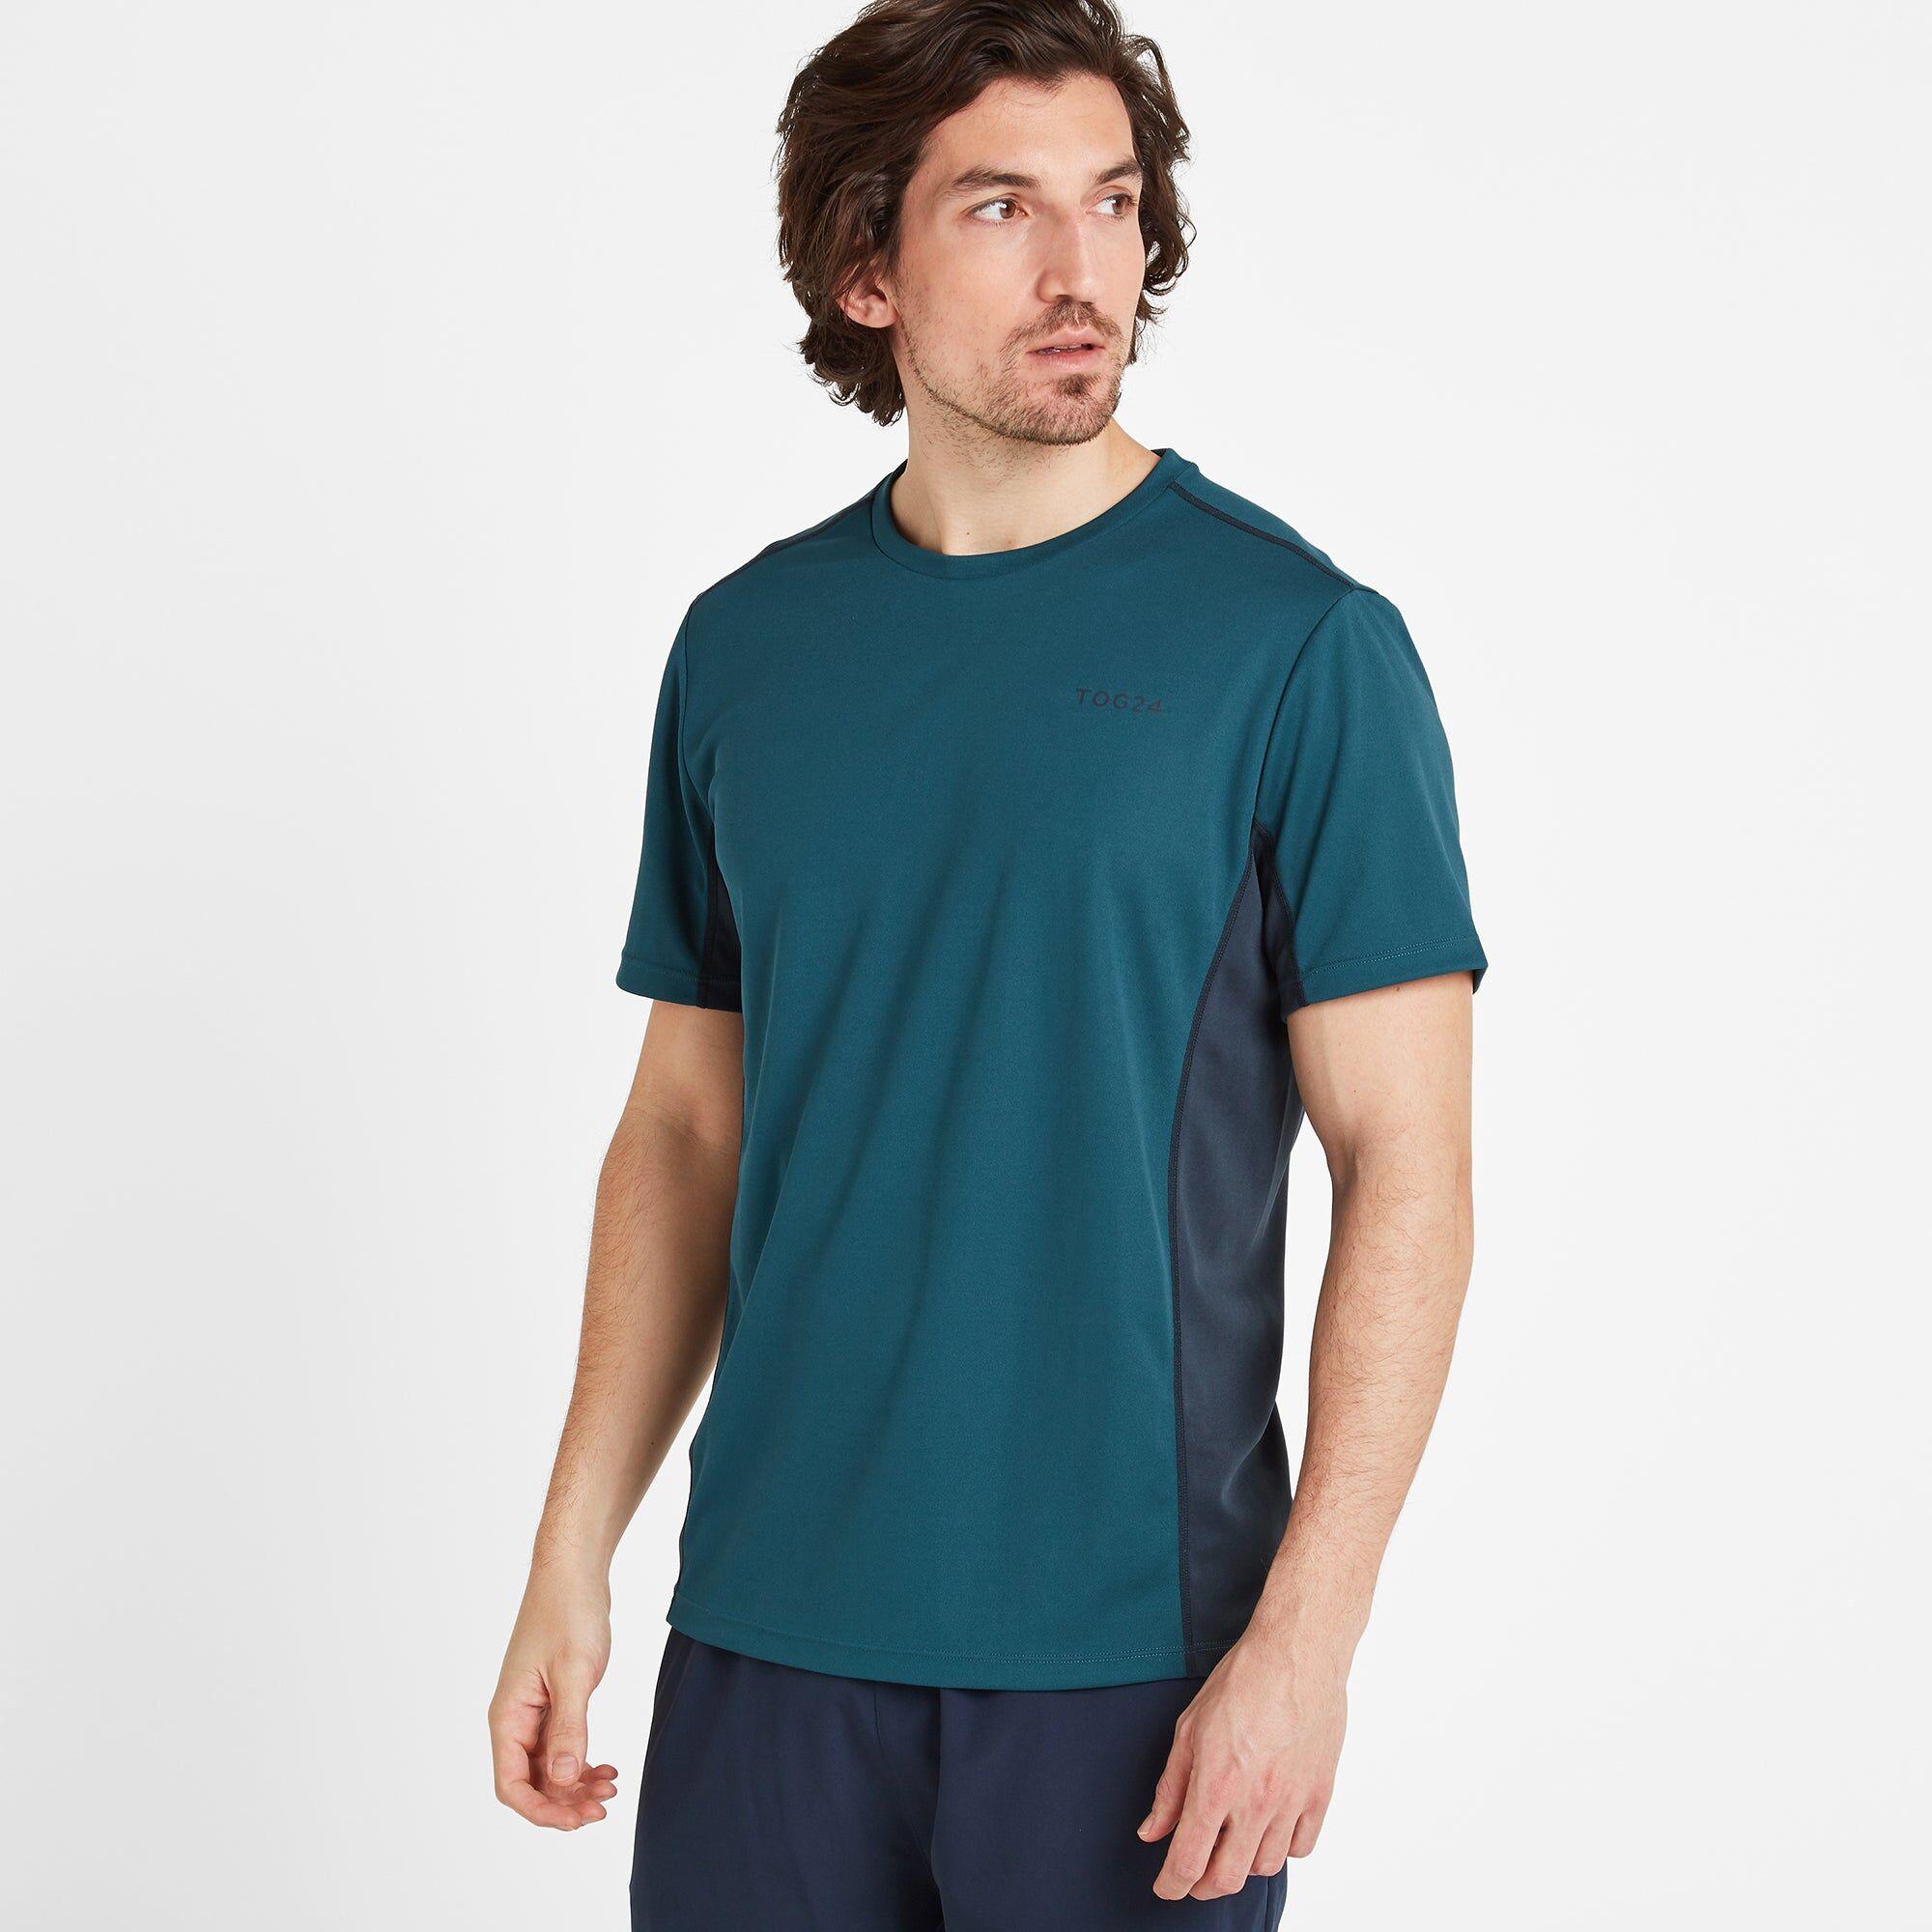 TOG24 Blackwell Mens Tech T-Shirt - Lagoon Blue - L